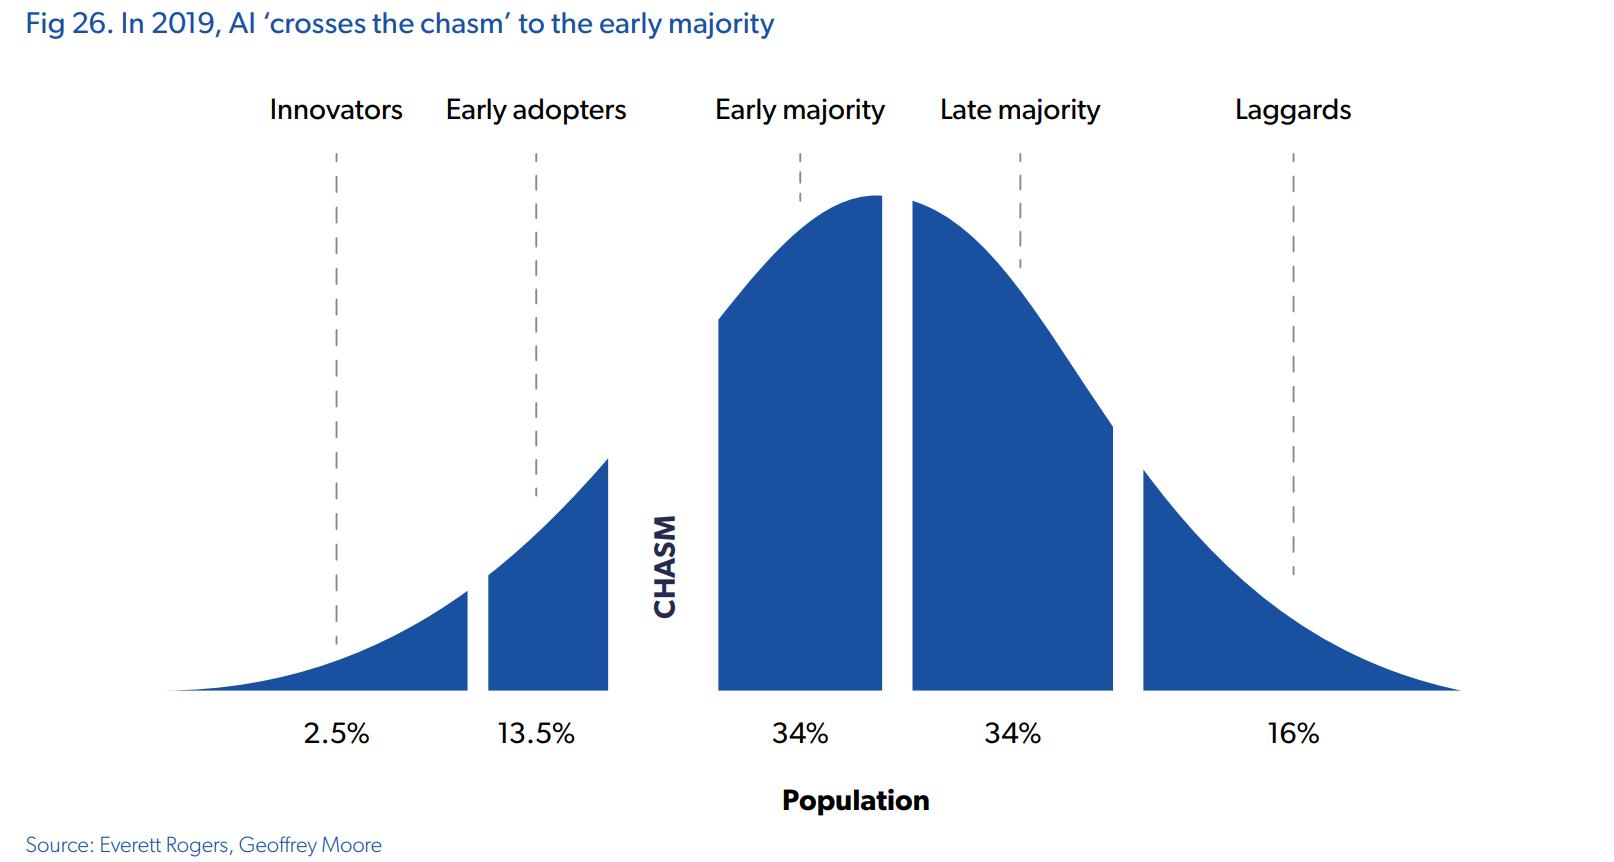 ai early majority adoption